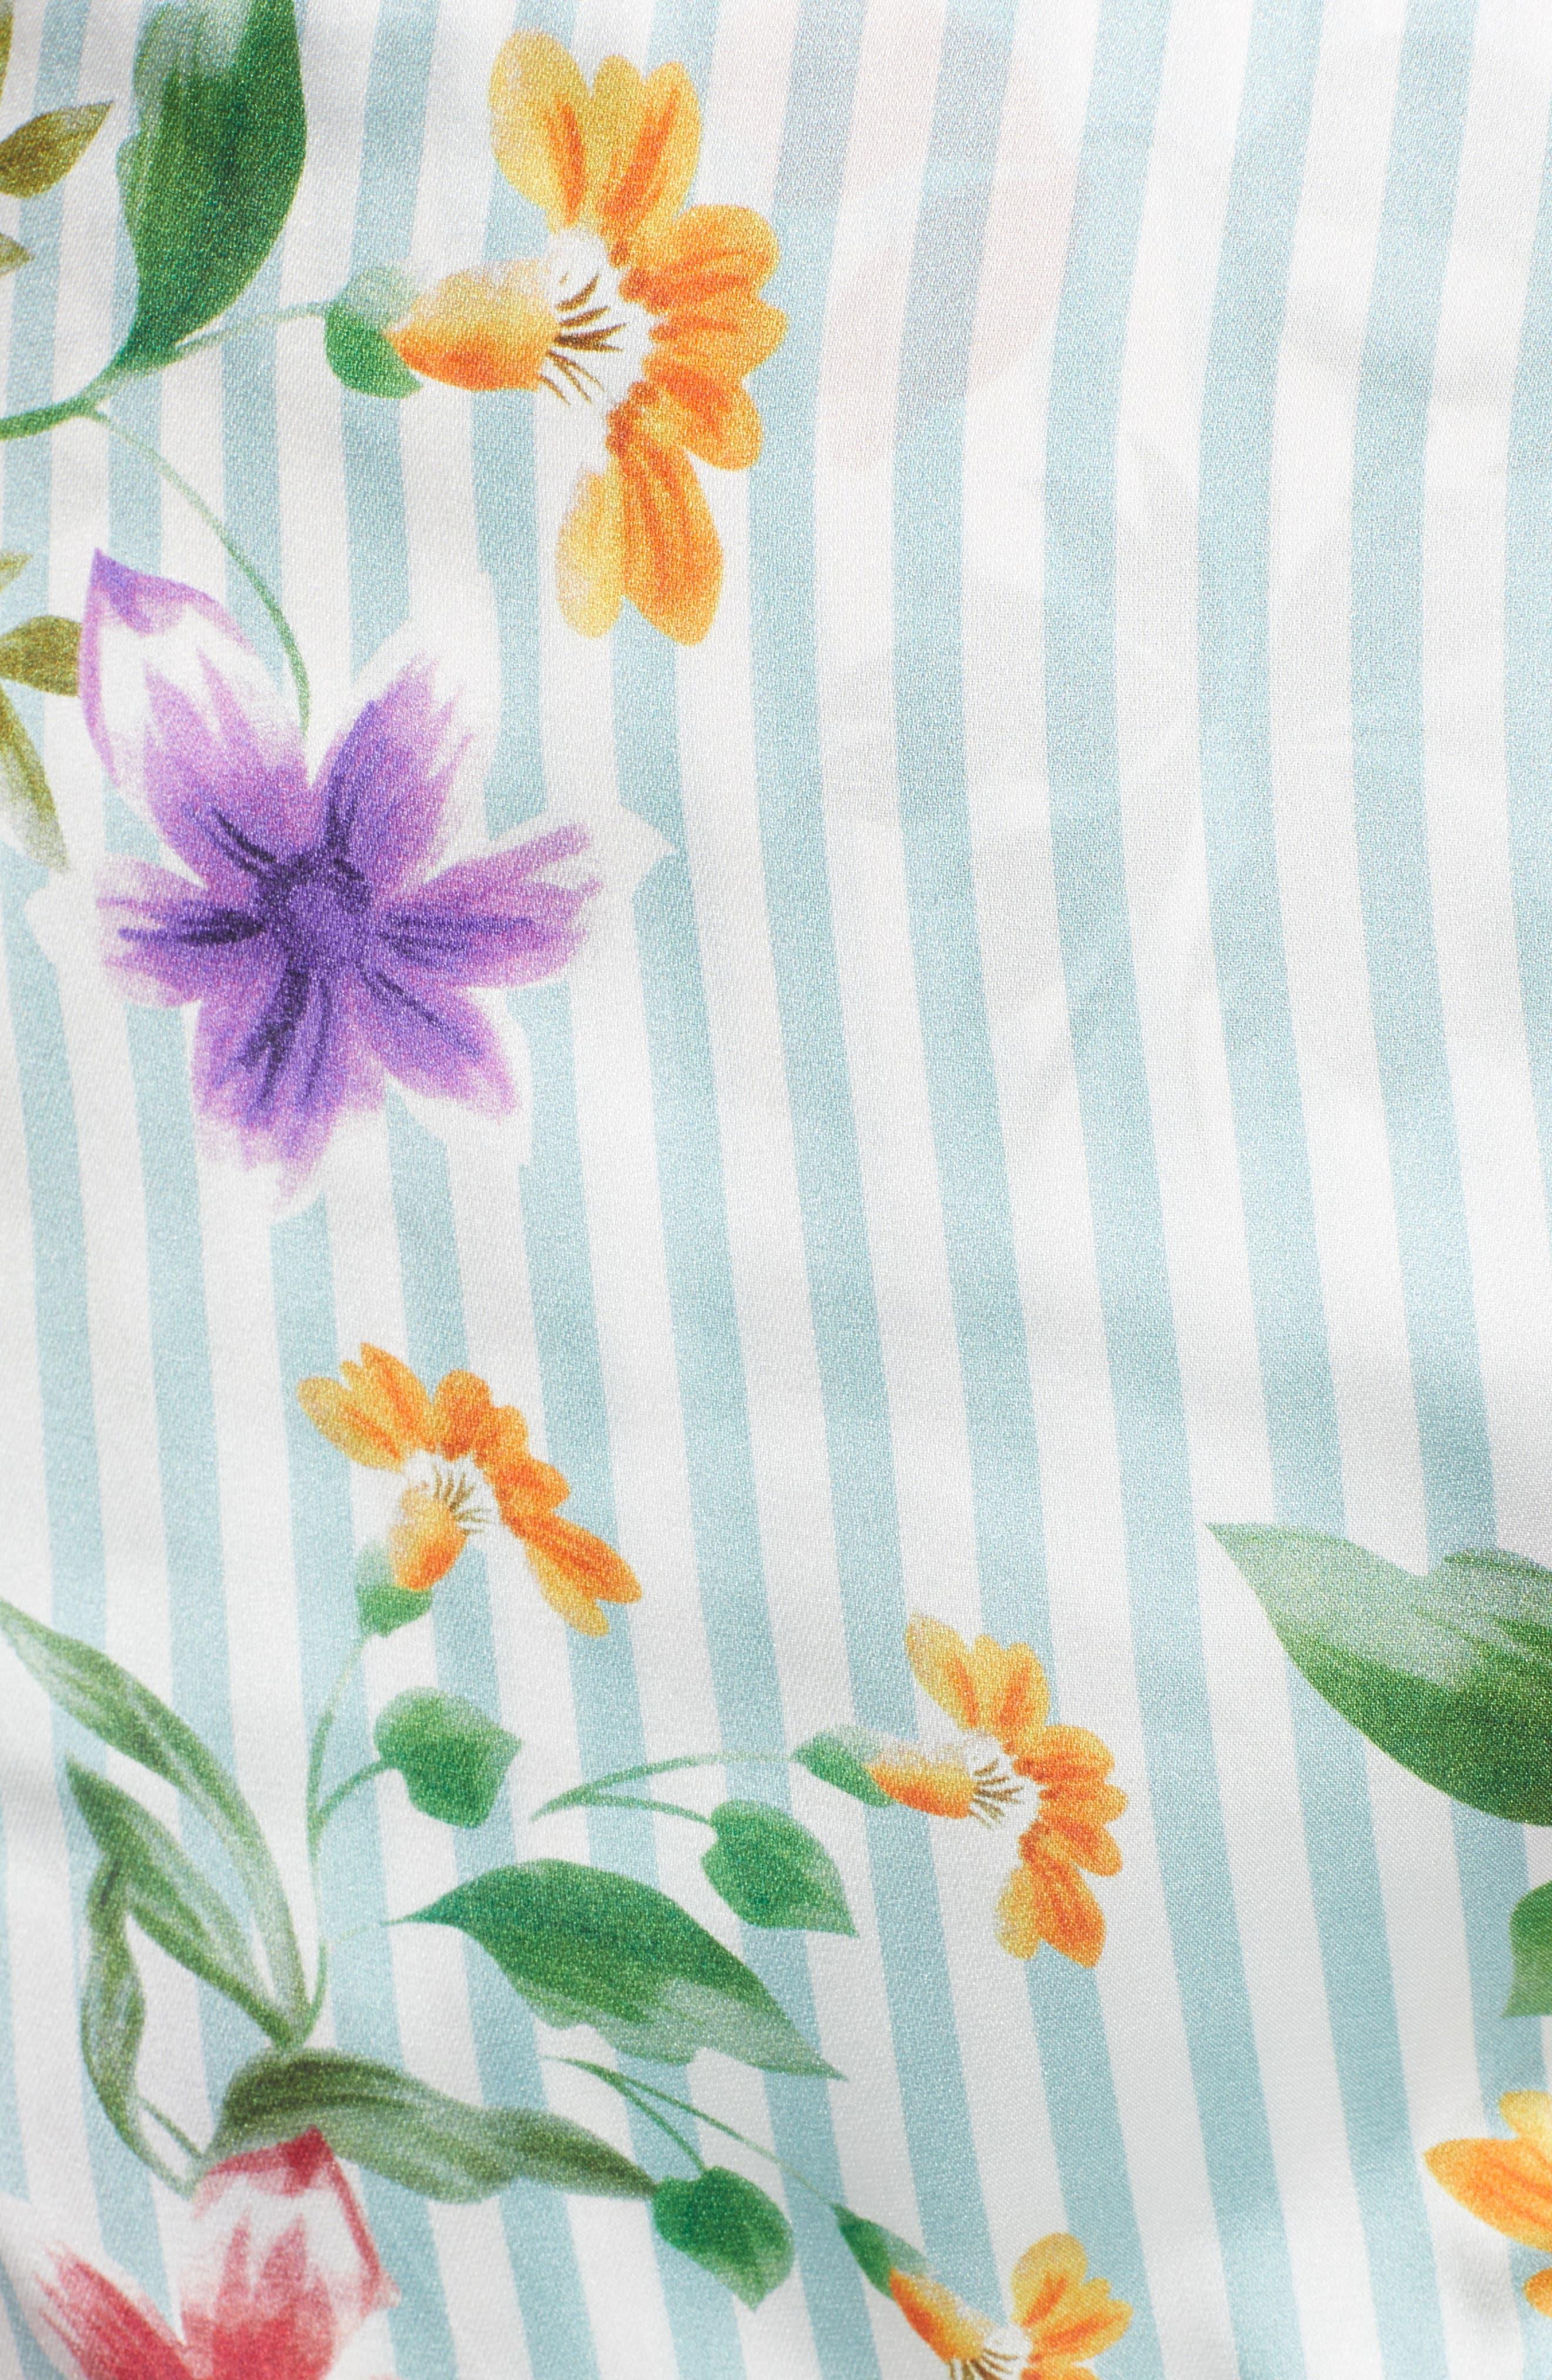 Barb Ruffle Dress,                             Alternate thumbnail 5, color,                             Blue Flowerbed